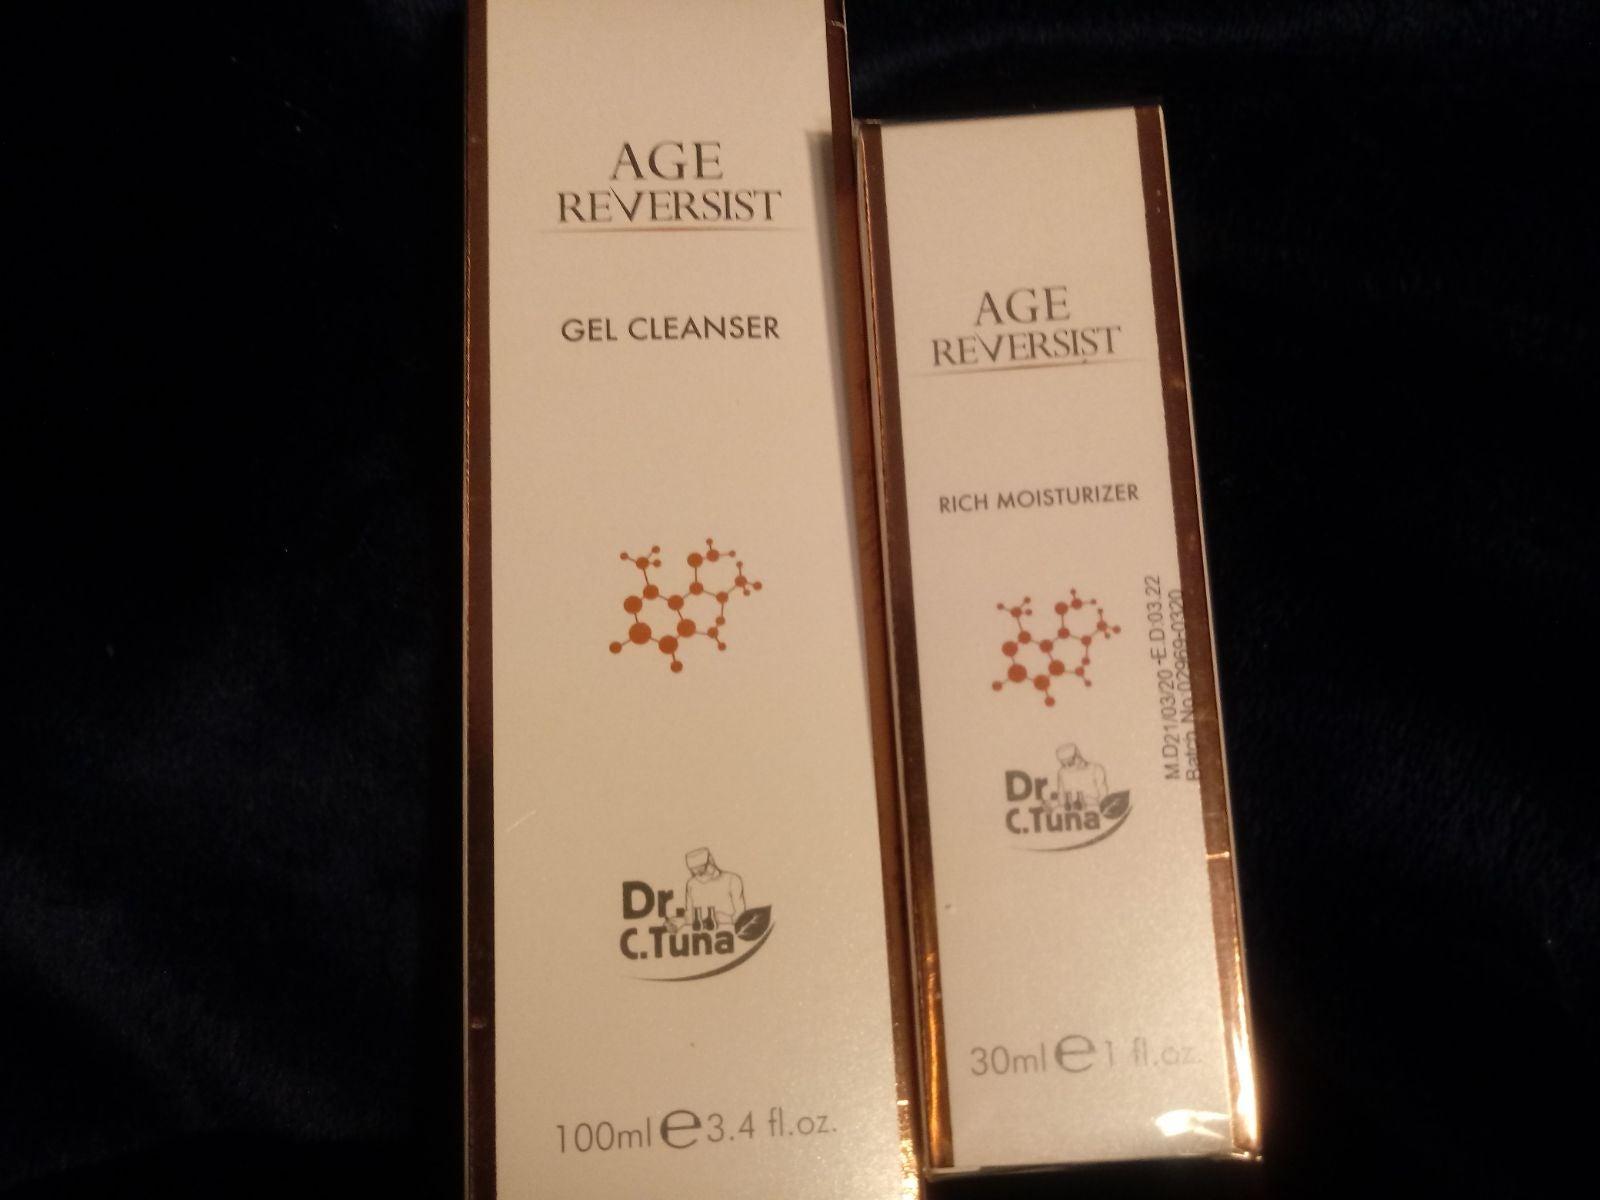 Age reversist gel cleanser and moisturiz